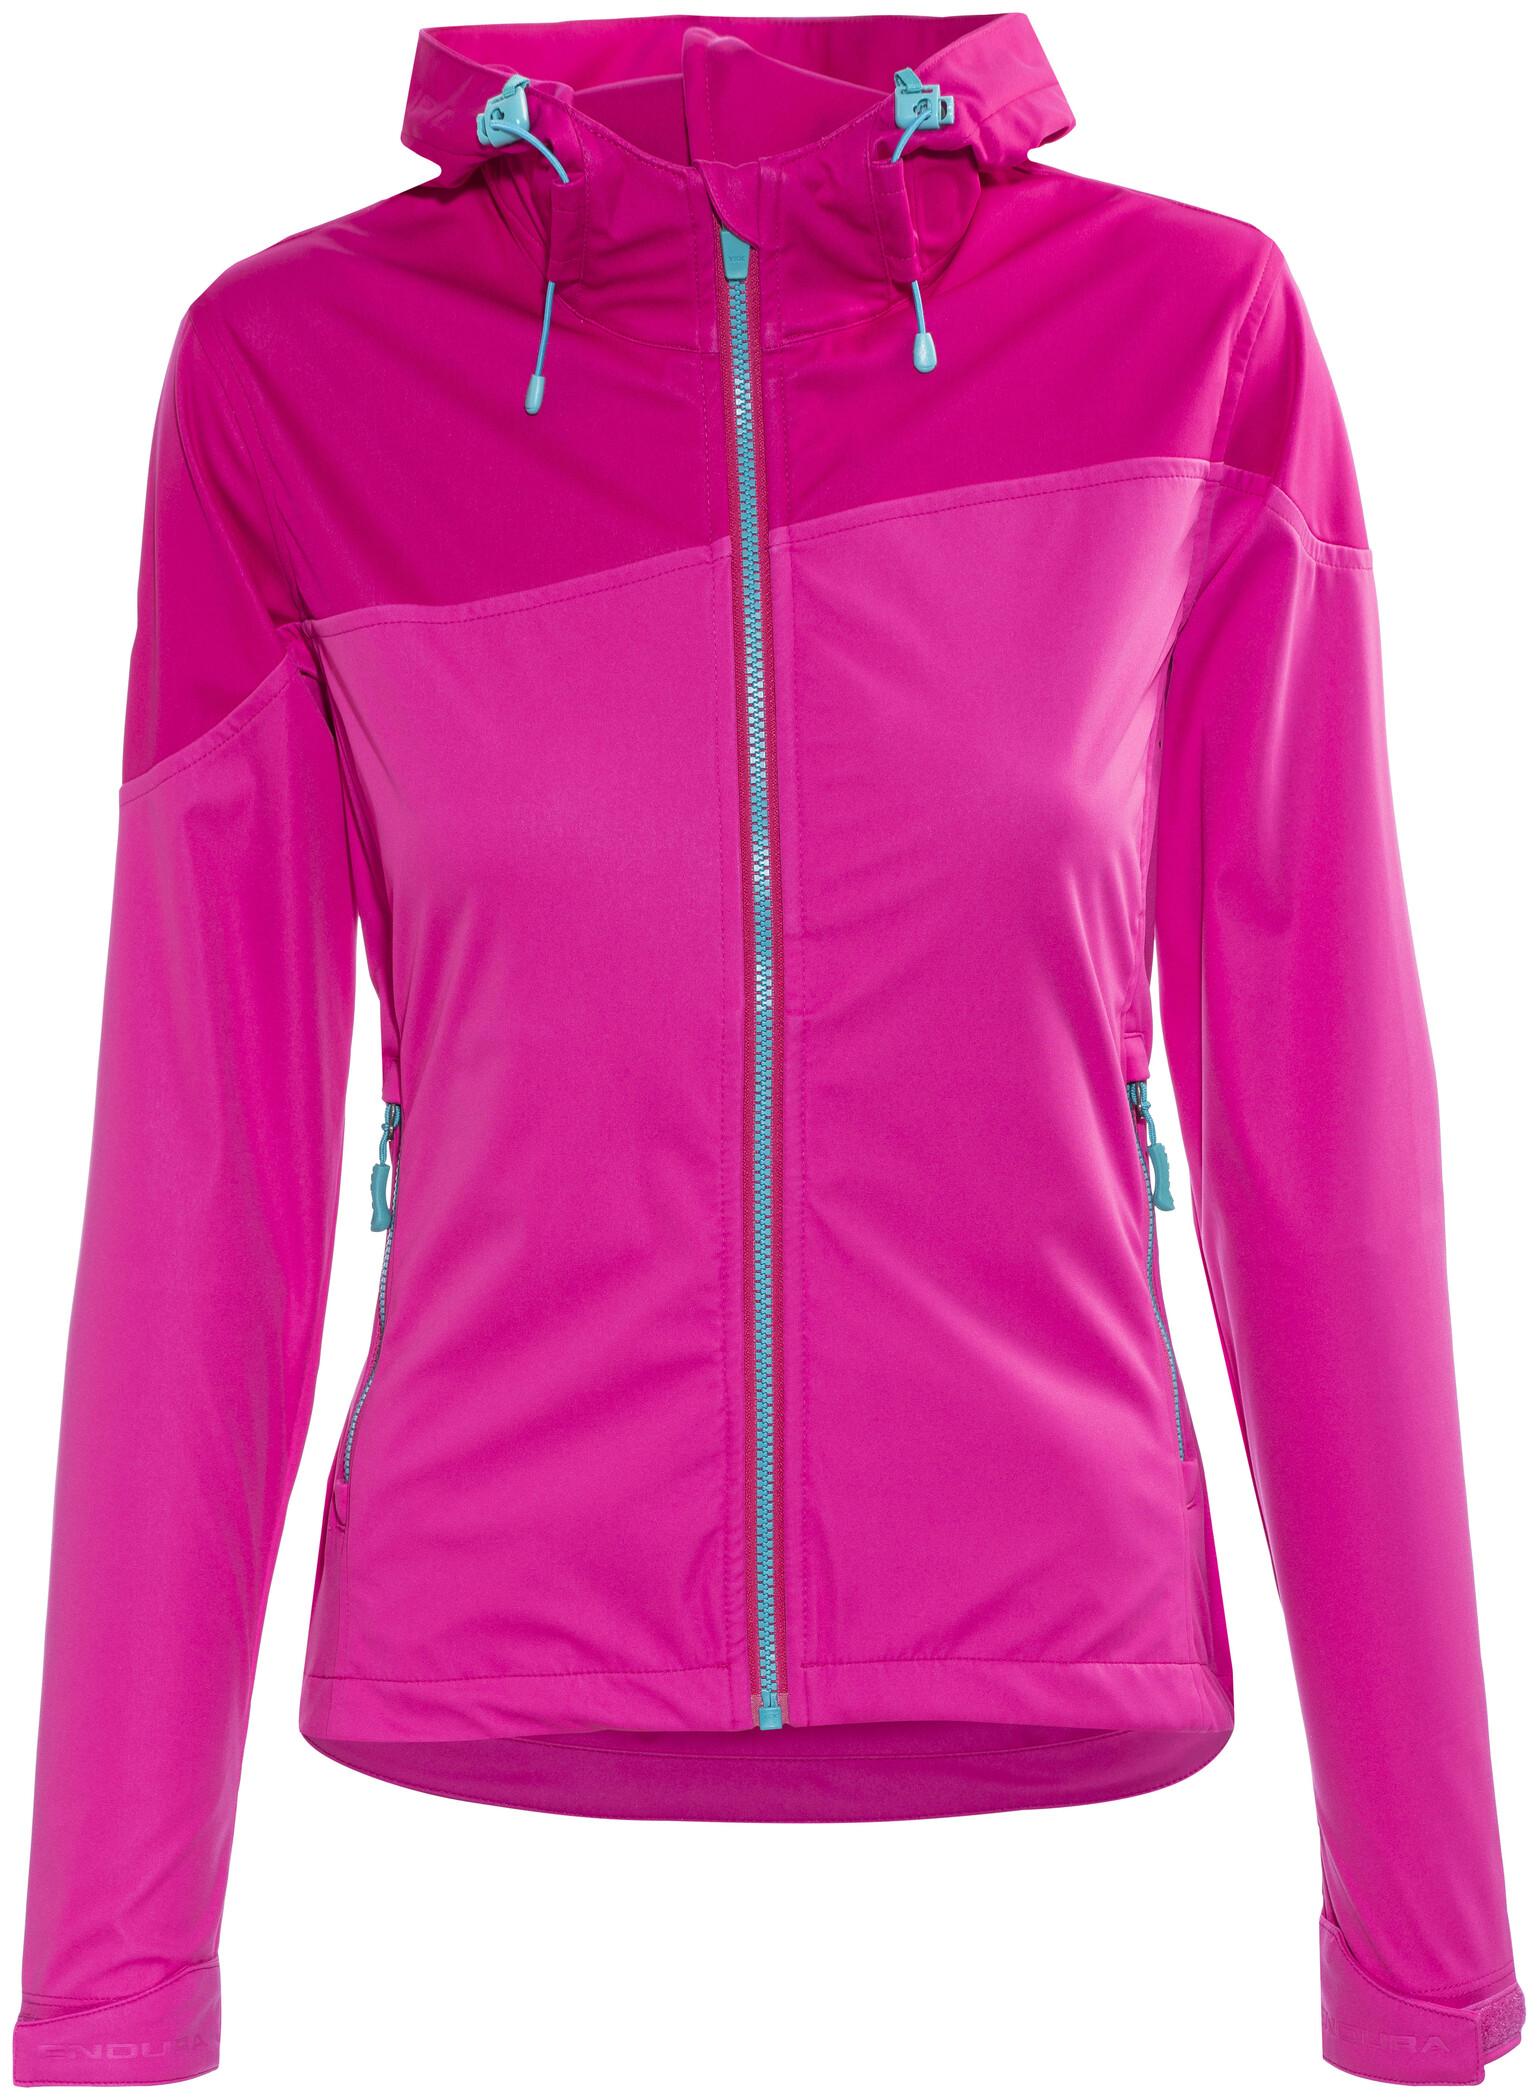 Endura - Singletrack | bike jacket